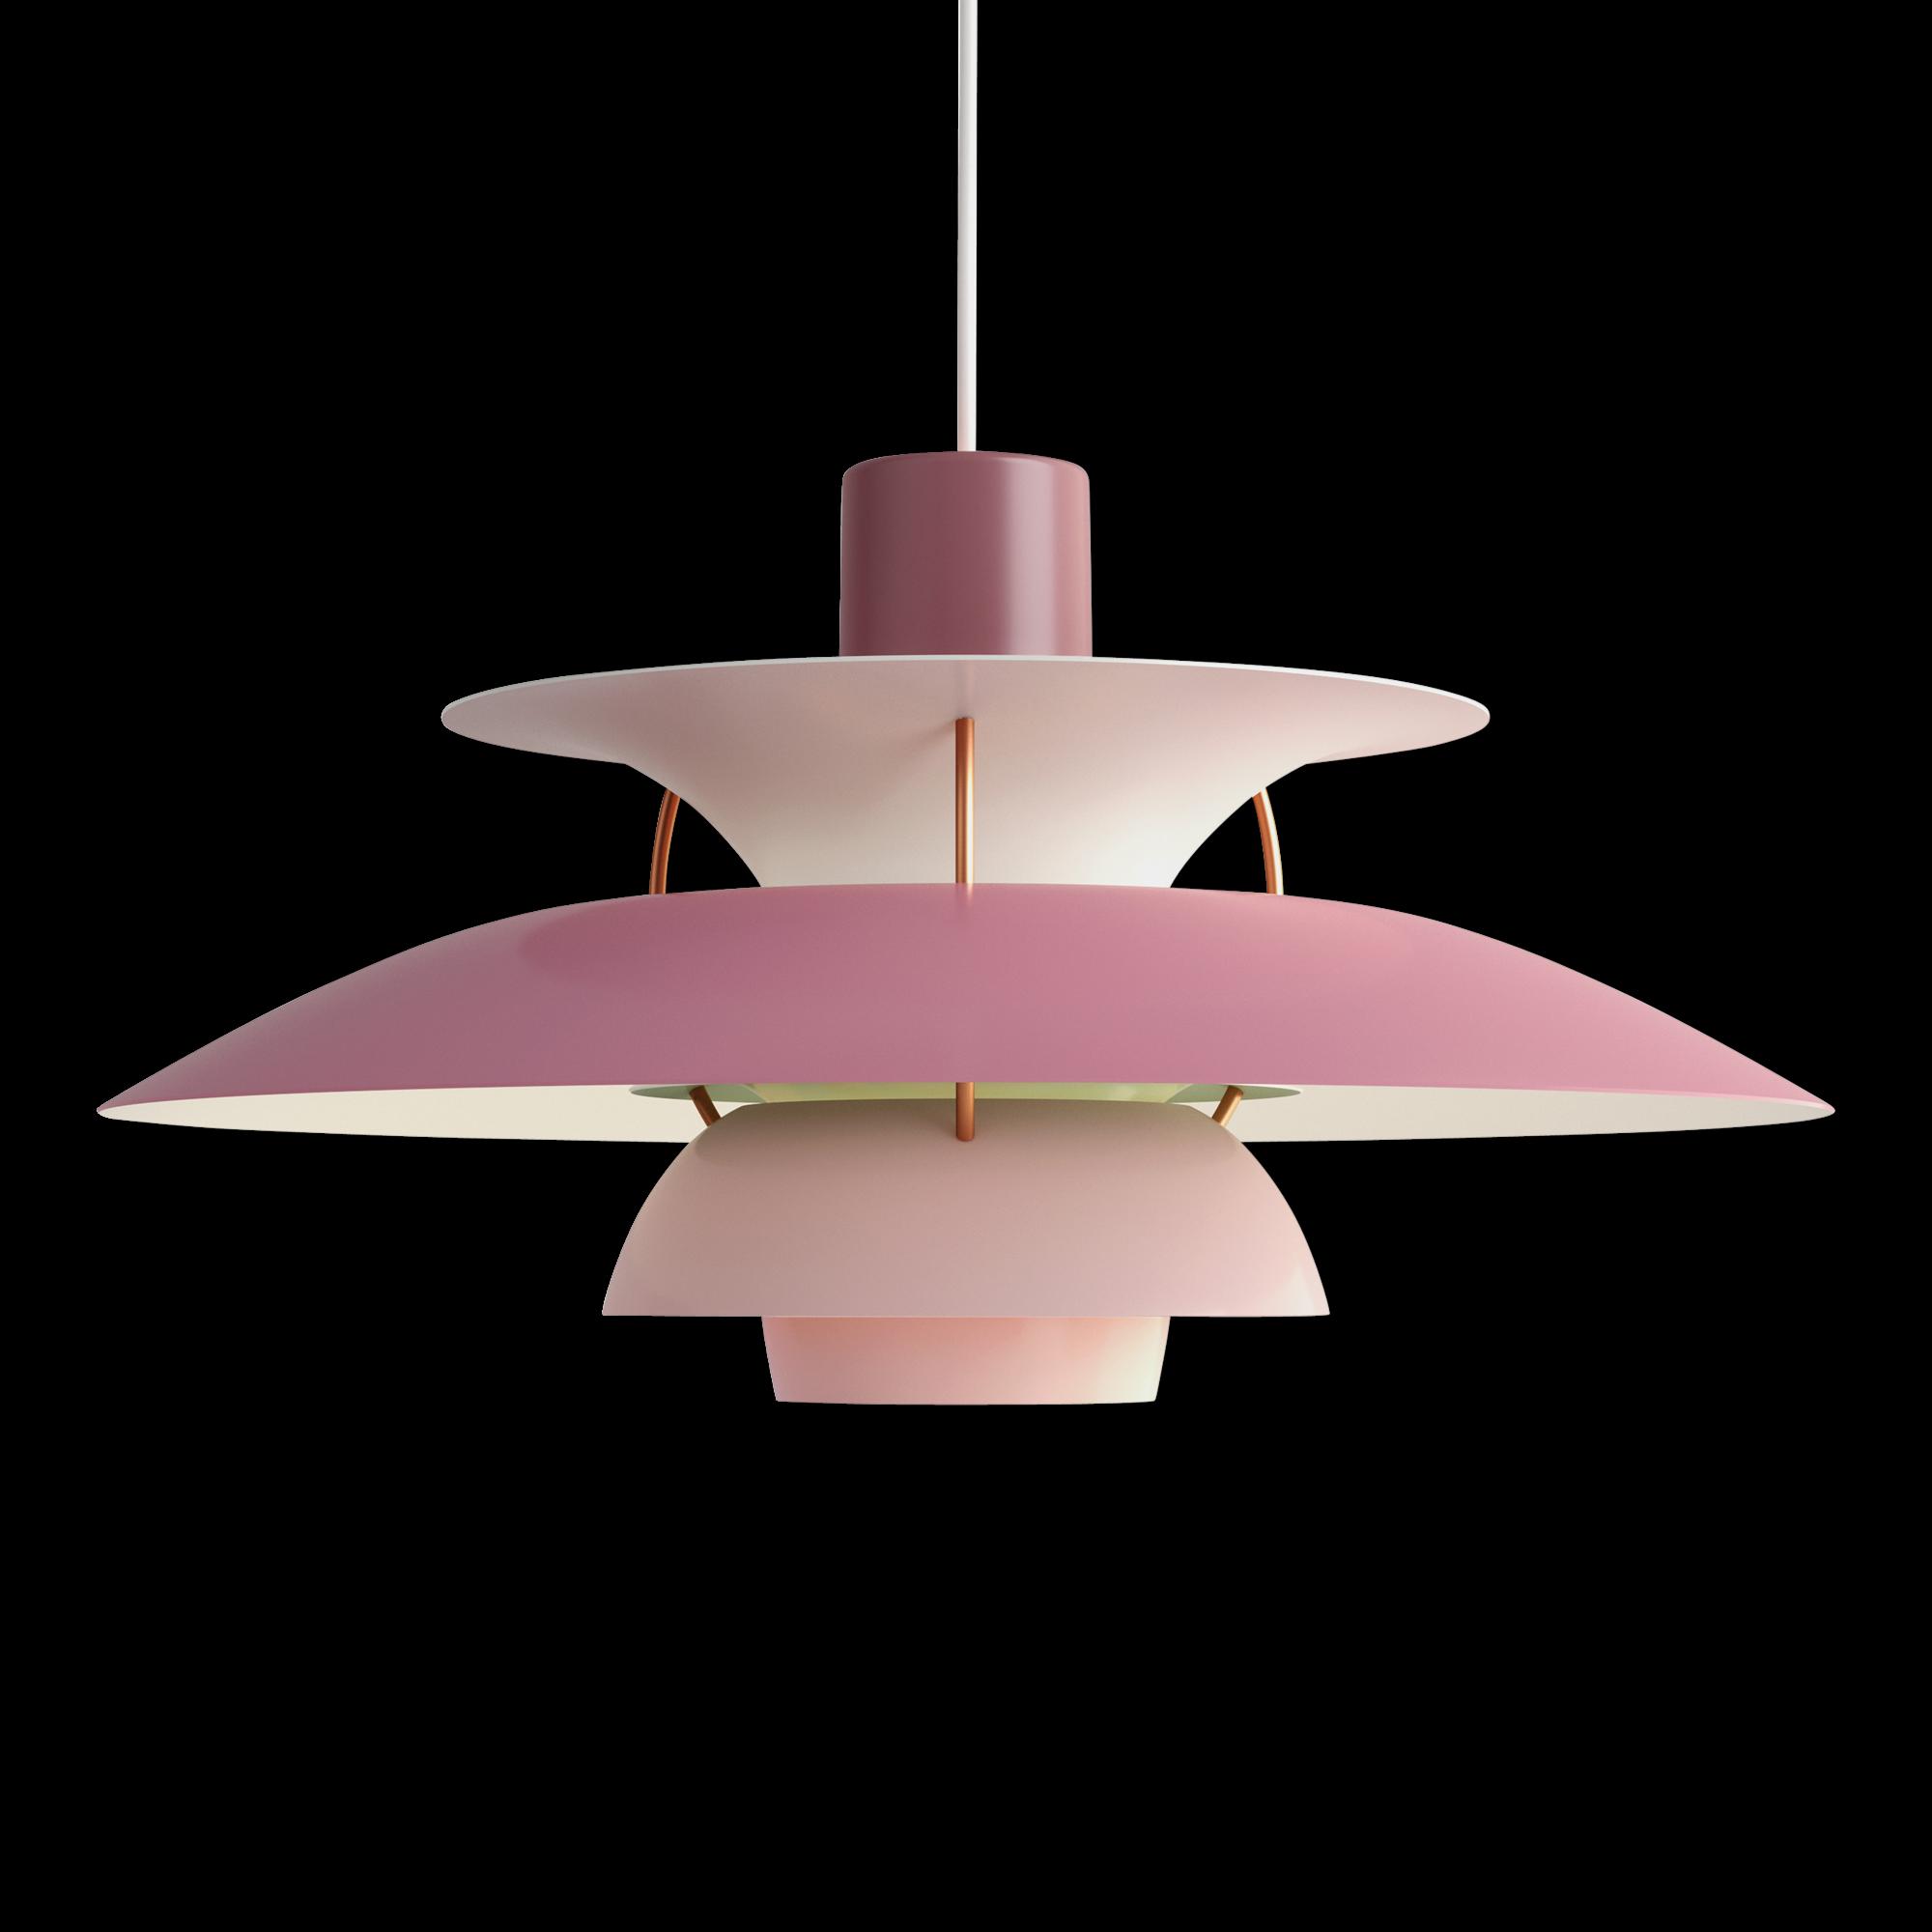 louis-poulsen-ph-5-rose-1